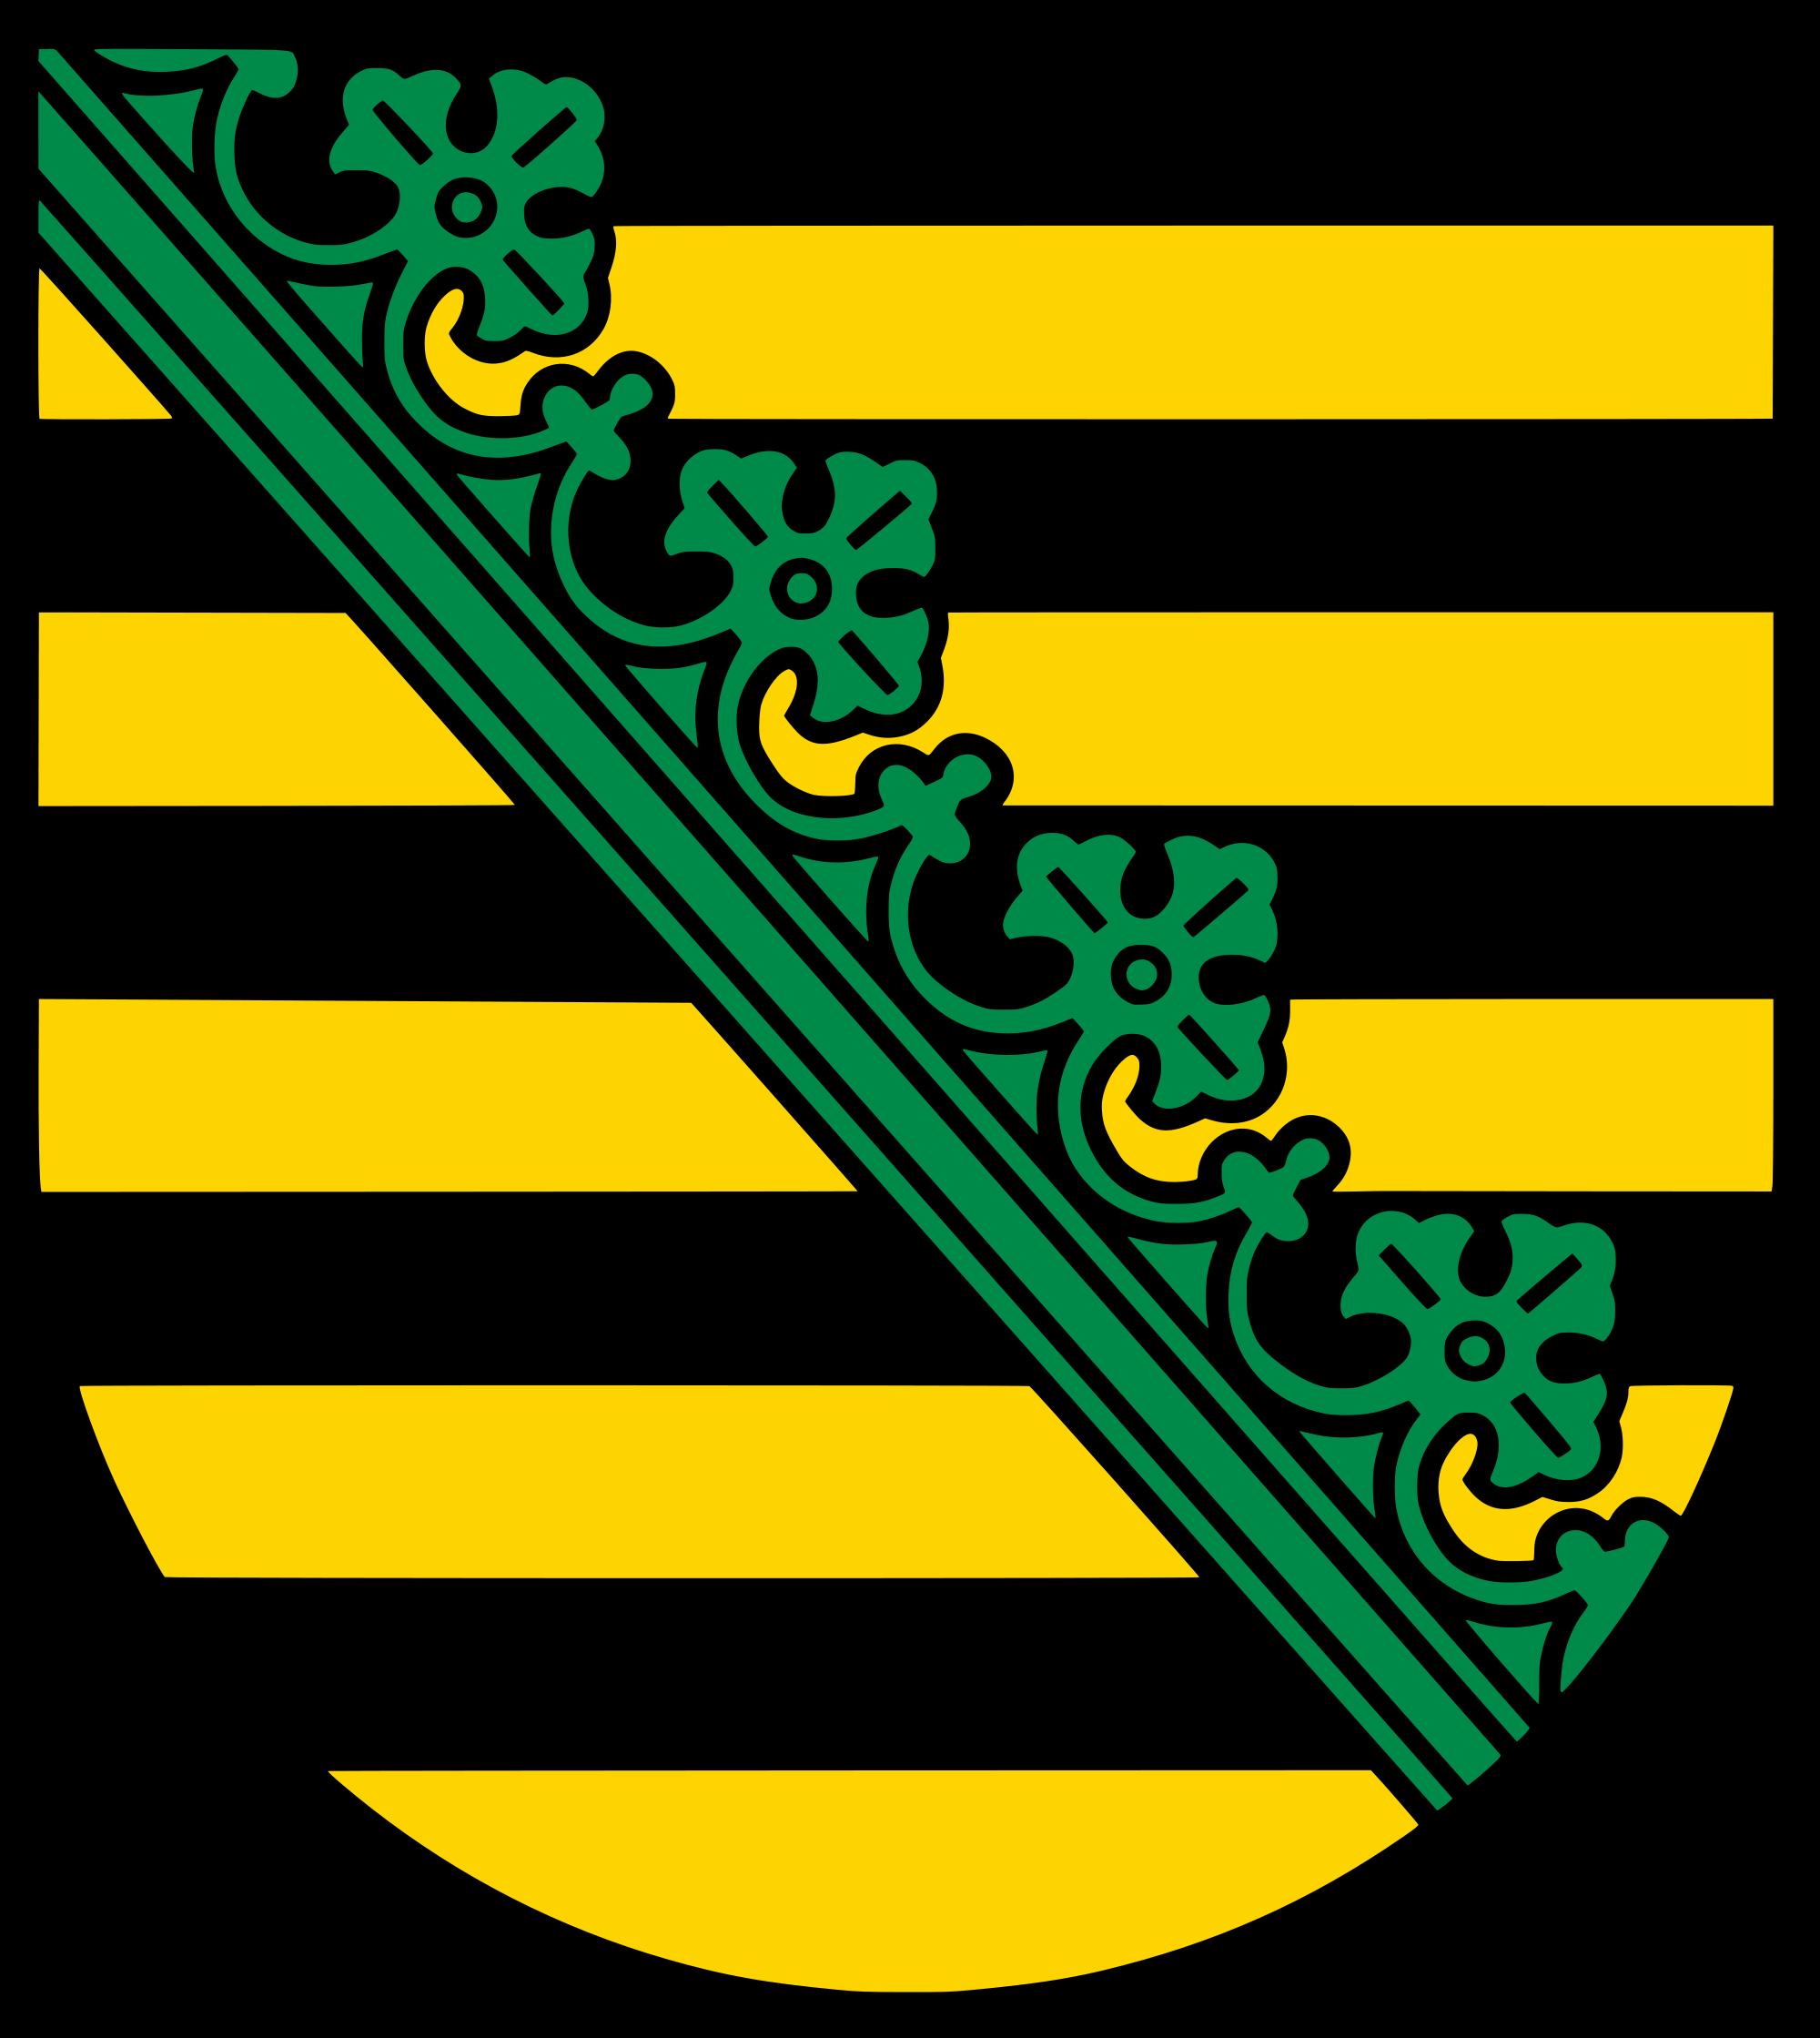 Wappen_Sachsen